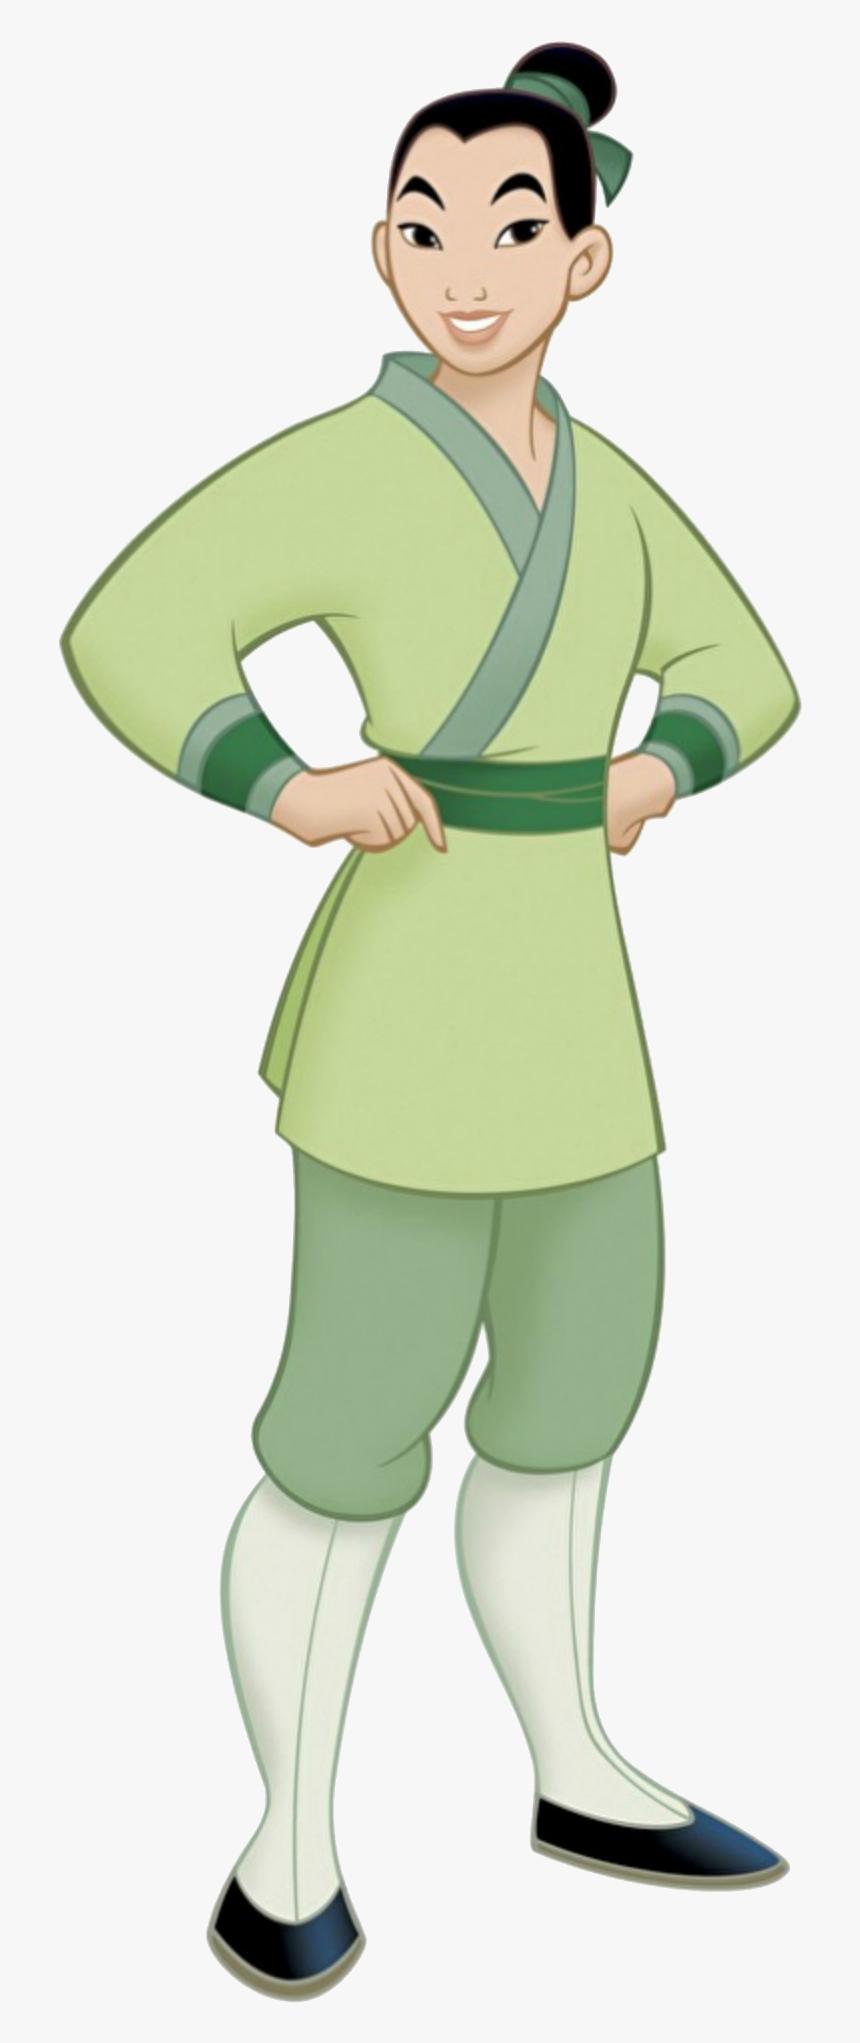 Vector Free Download Image Png Disney Princess Mulan Disney Princess Transparent Png Download Transparent Png Image Pngitem